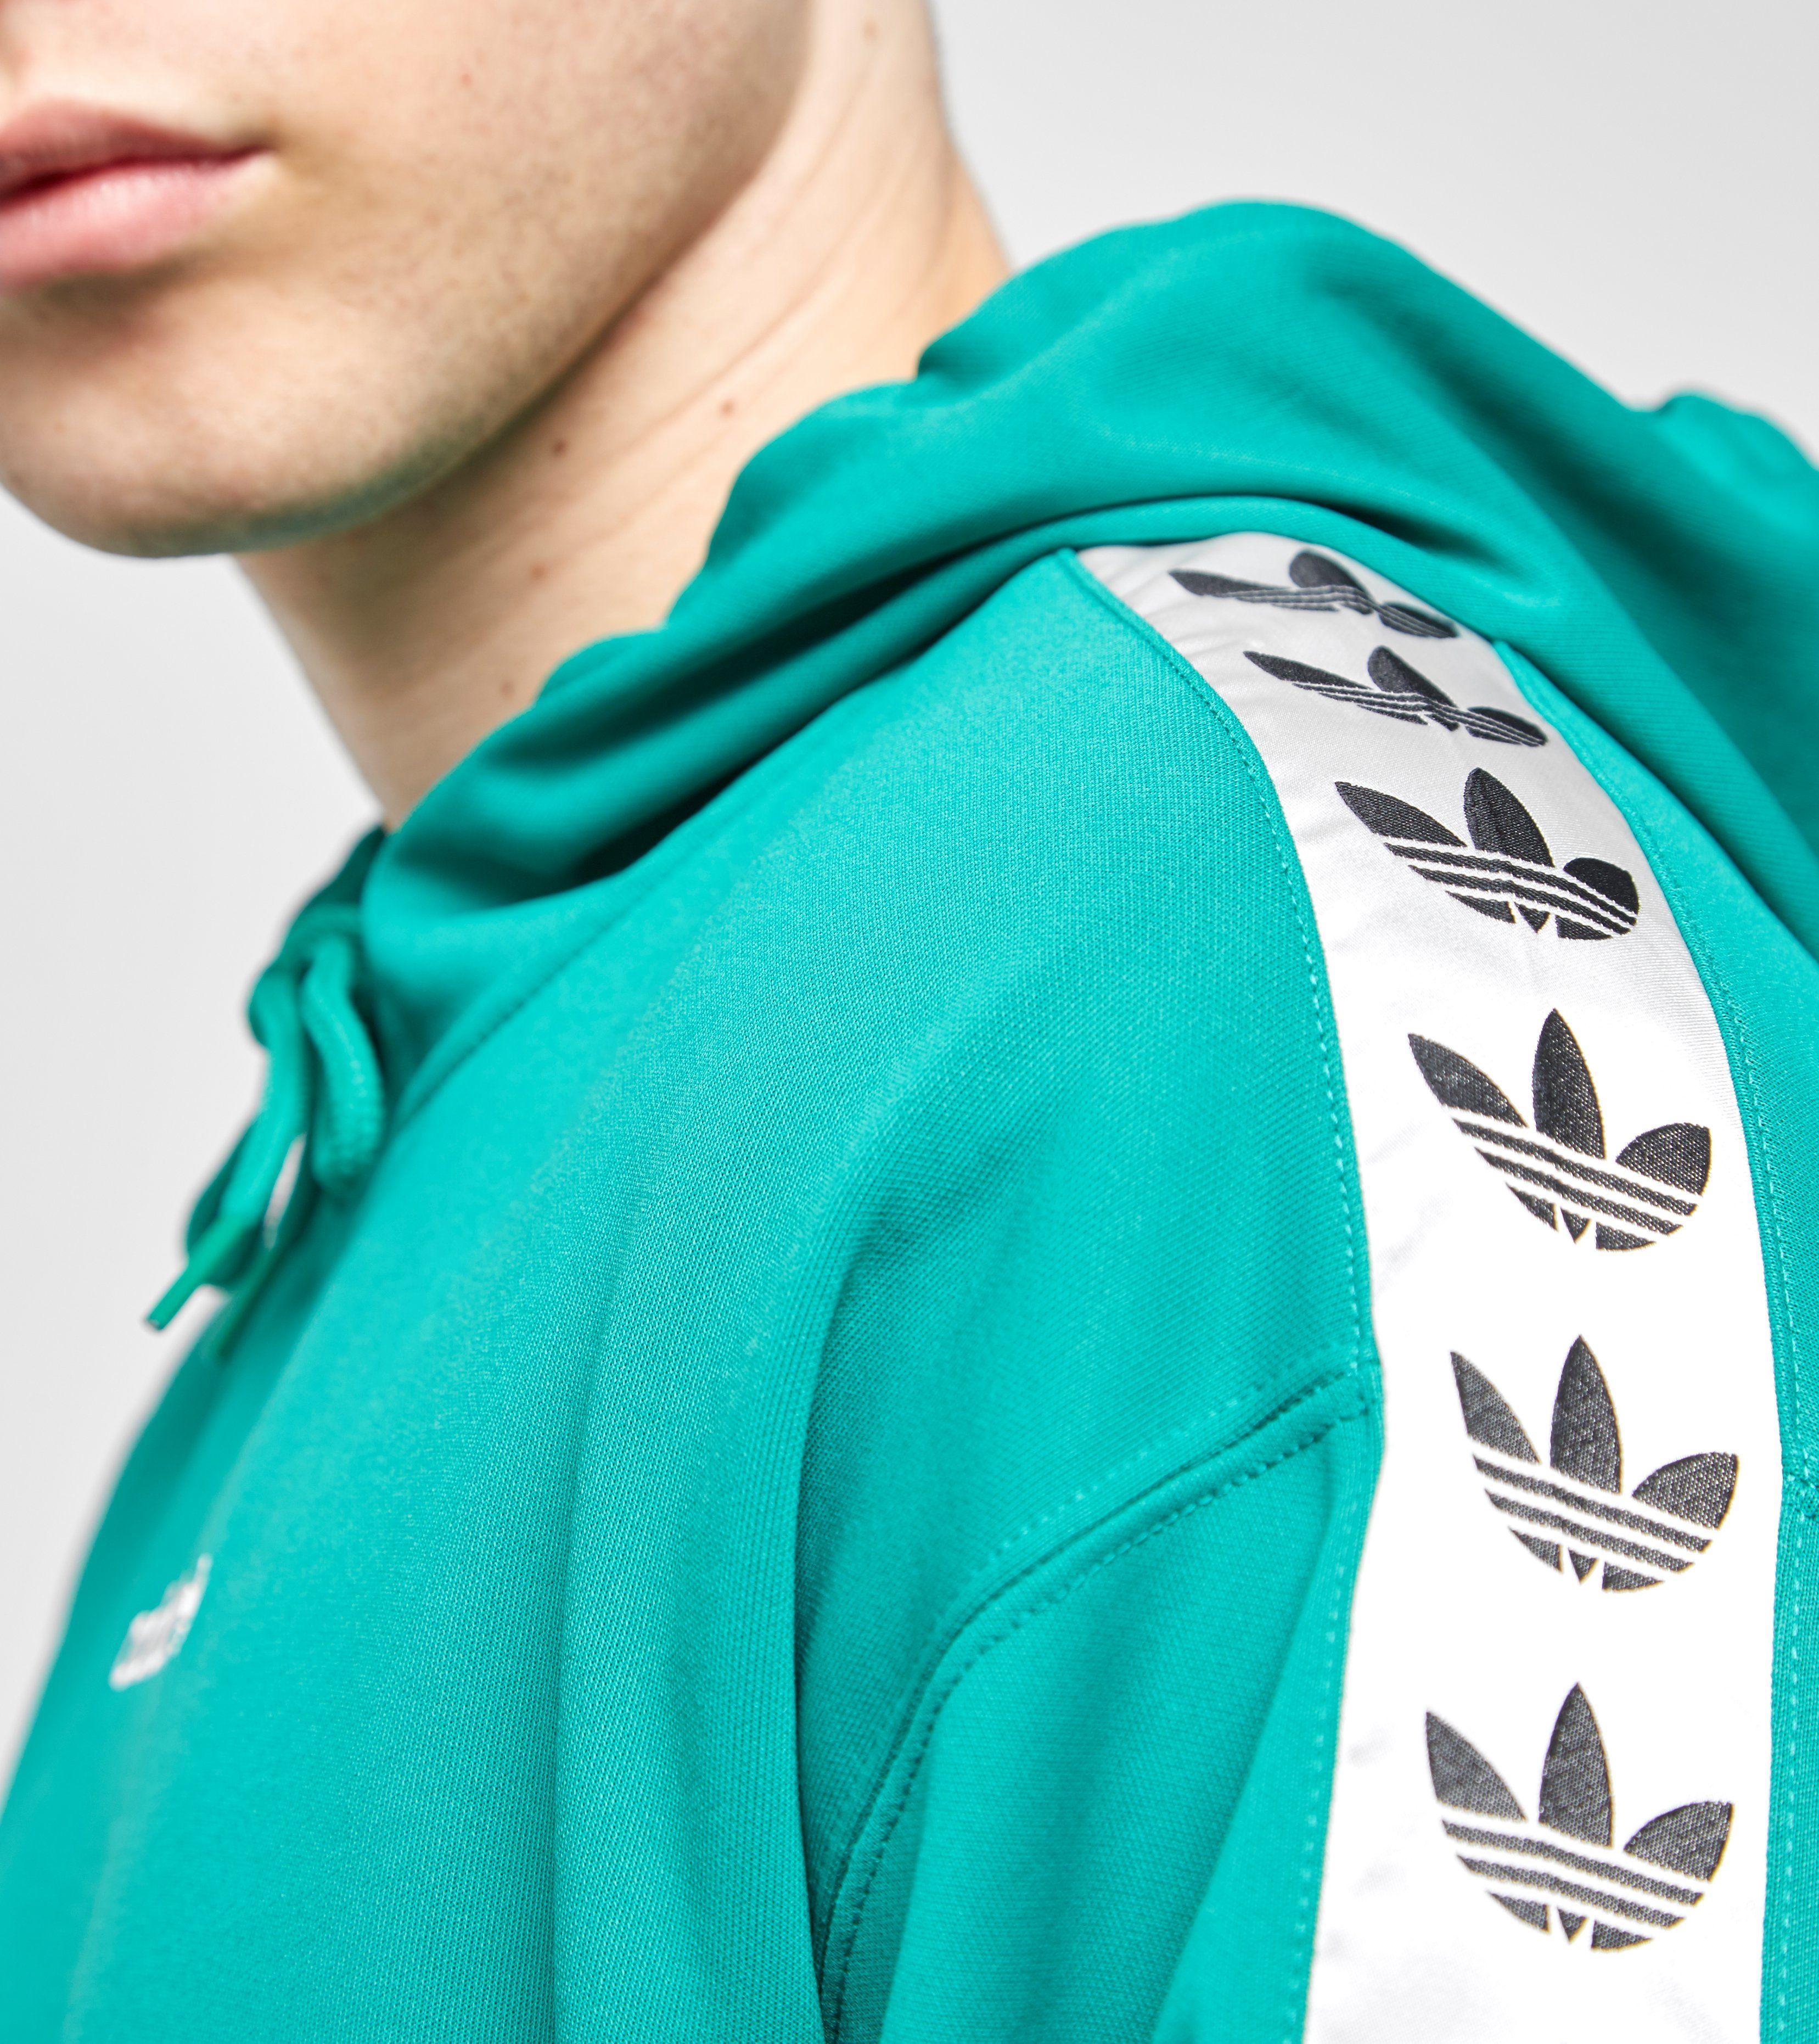 adidas Originals Overhead Tape Hoody - size? Exclusive